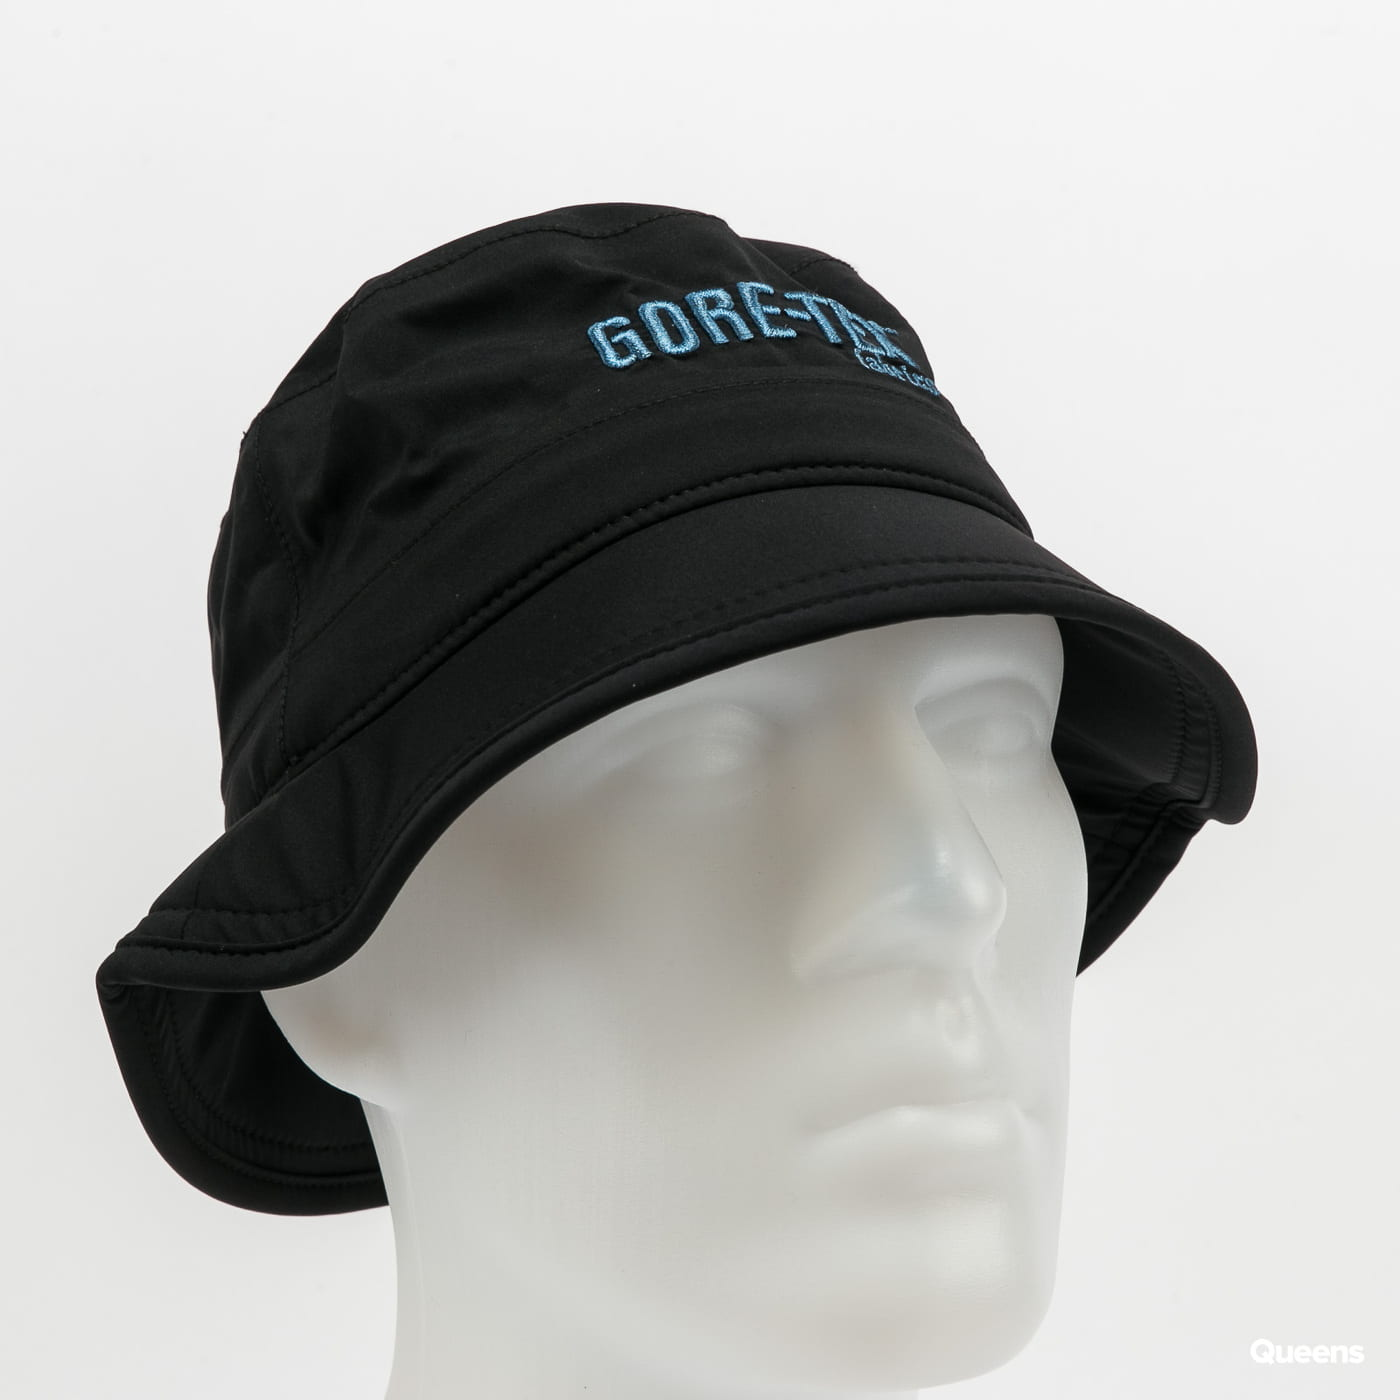 New Era Image Goretex Bucket černý / modrý